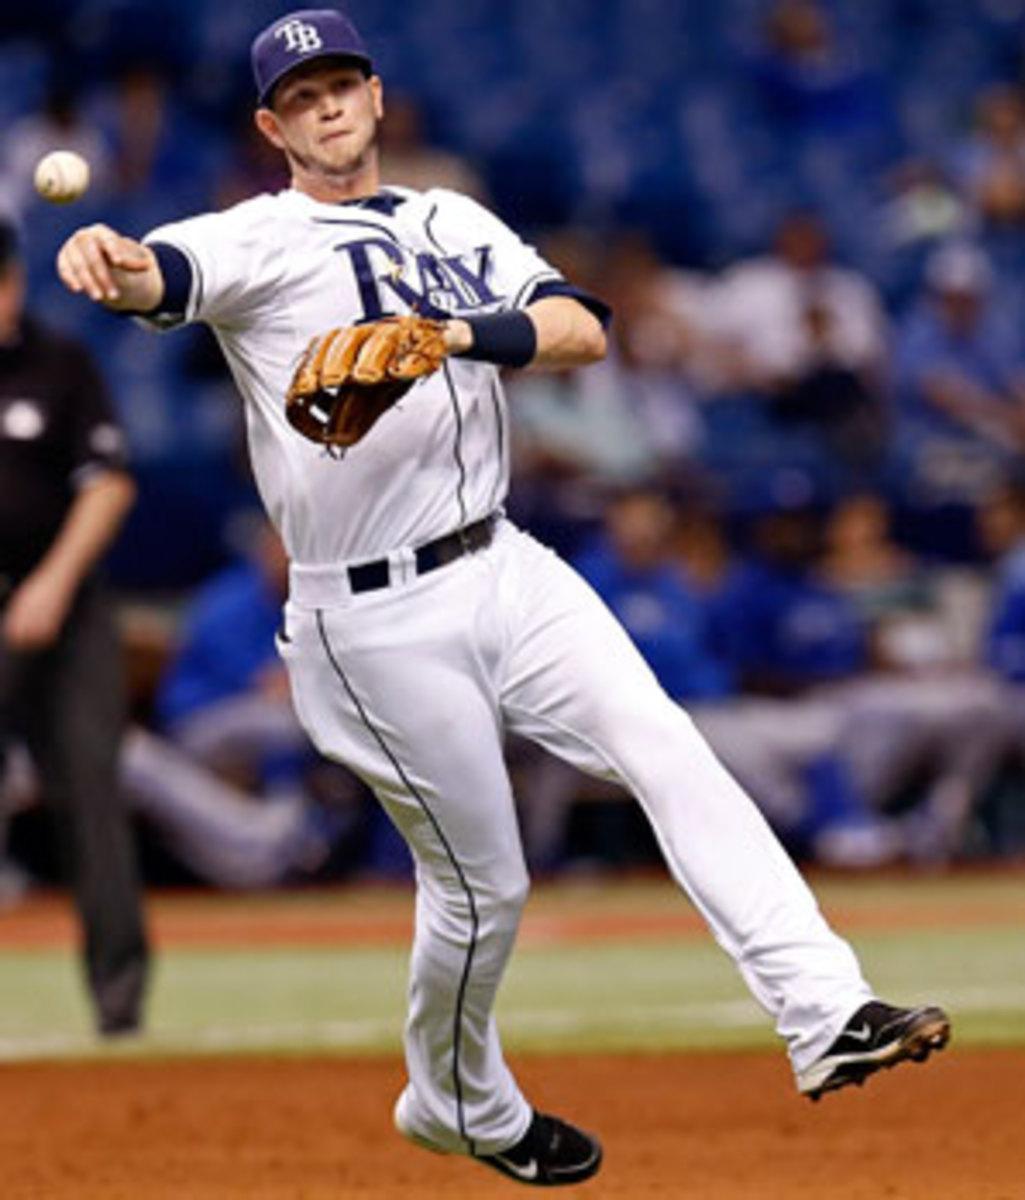 Reid Brignac played just 16 games for the Rays last season, hitting .095.